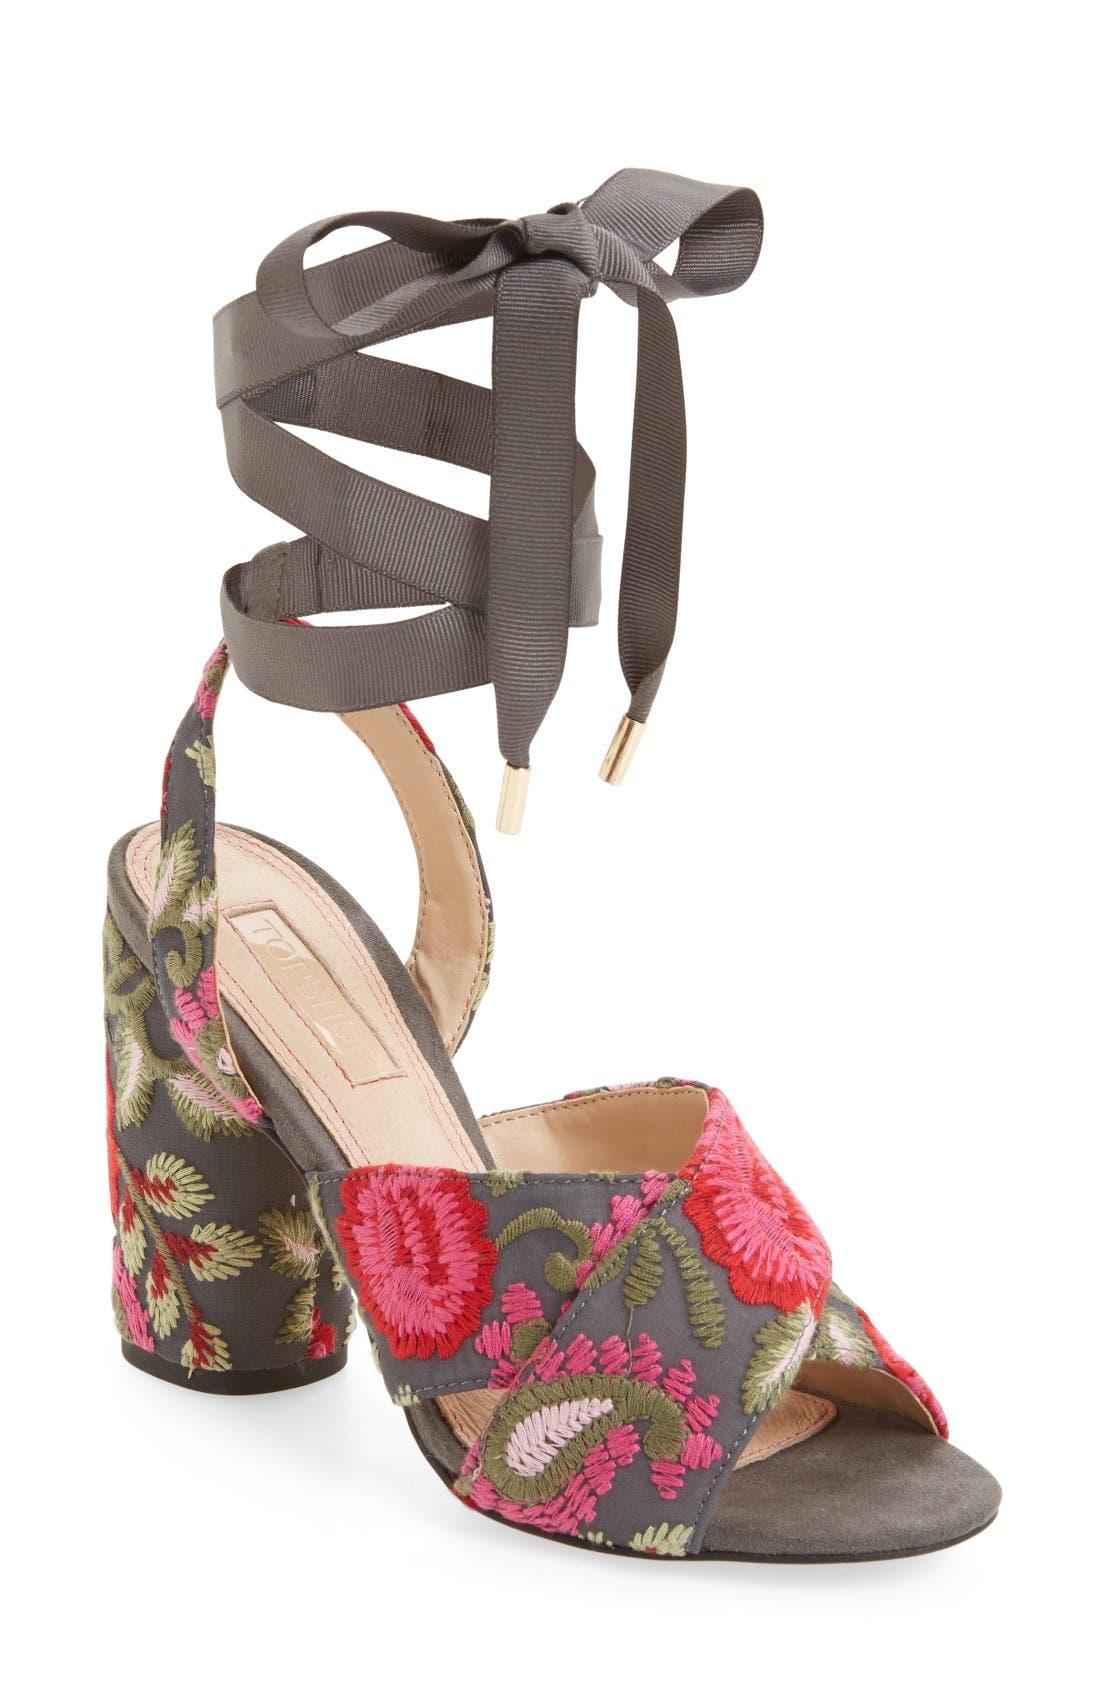 Main Image - Topshop Reena Embroidered Sandal (Women)